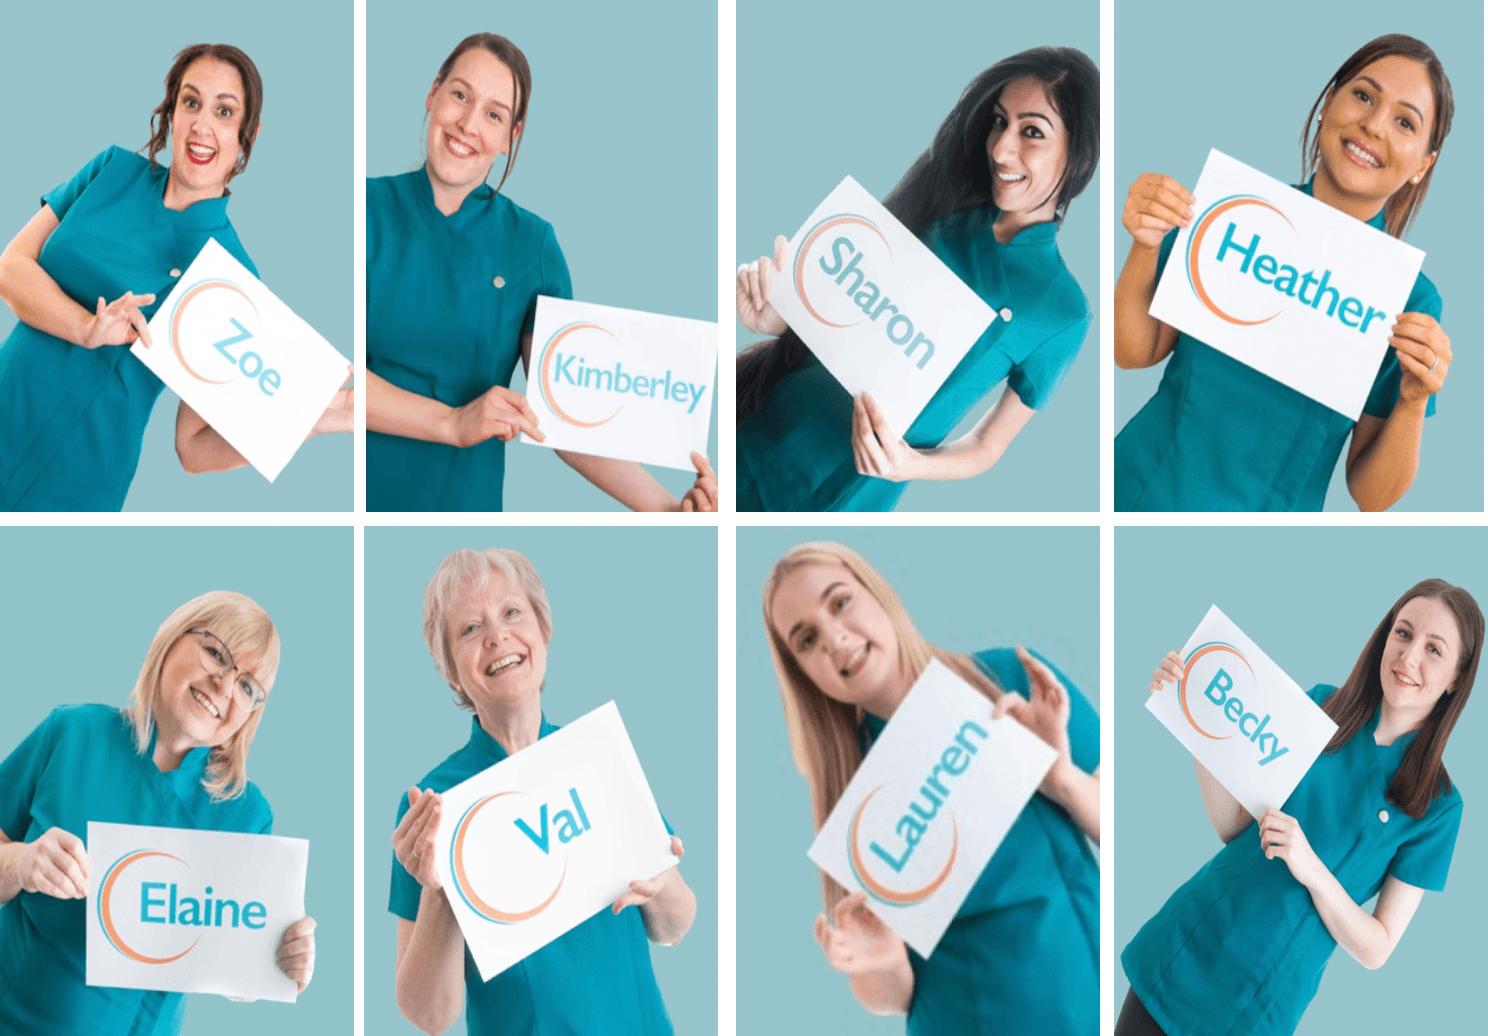 Diana Dental New Team Members